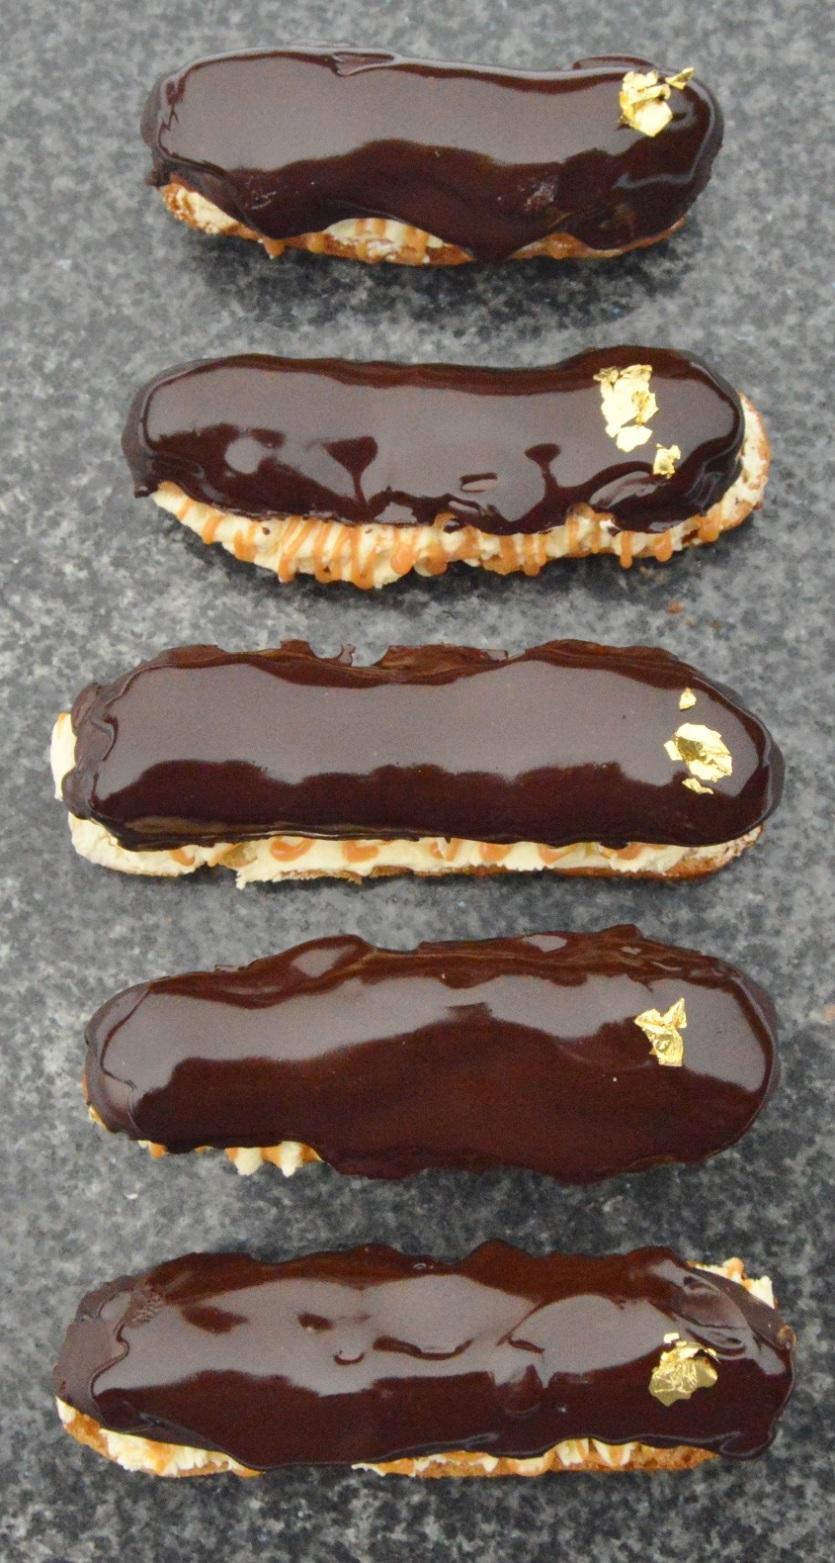 chocolate & salted caramel éclairs